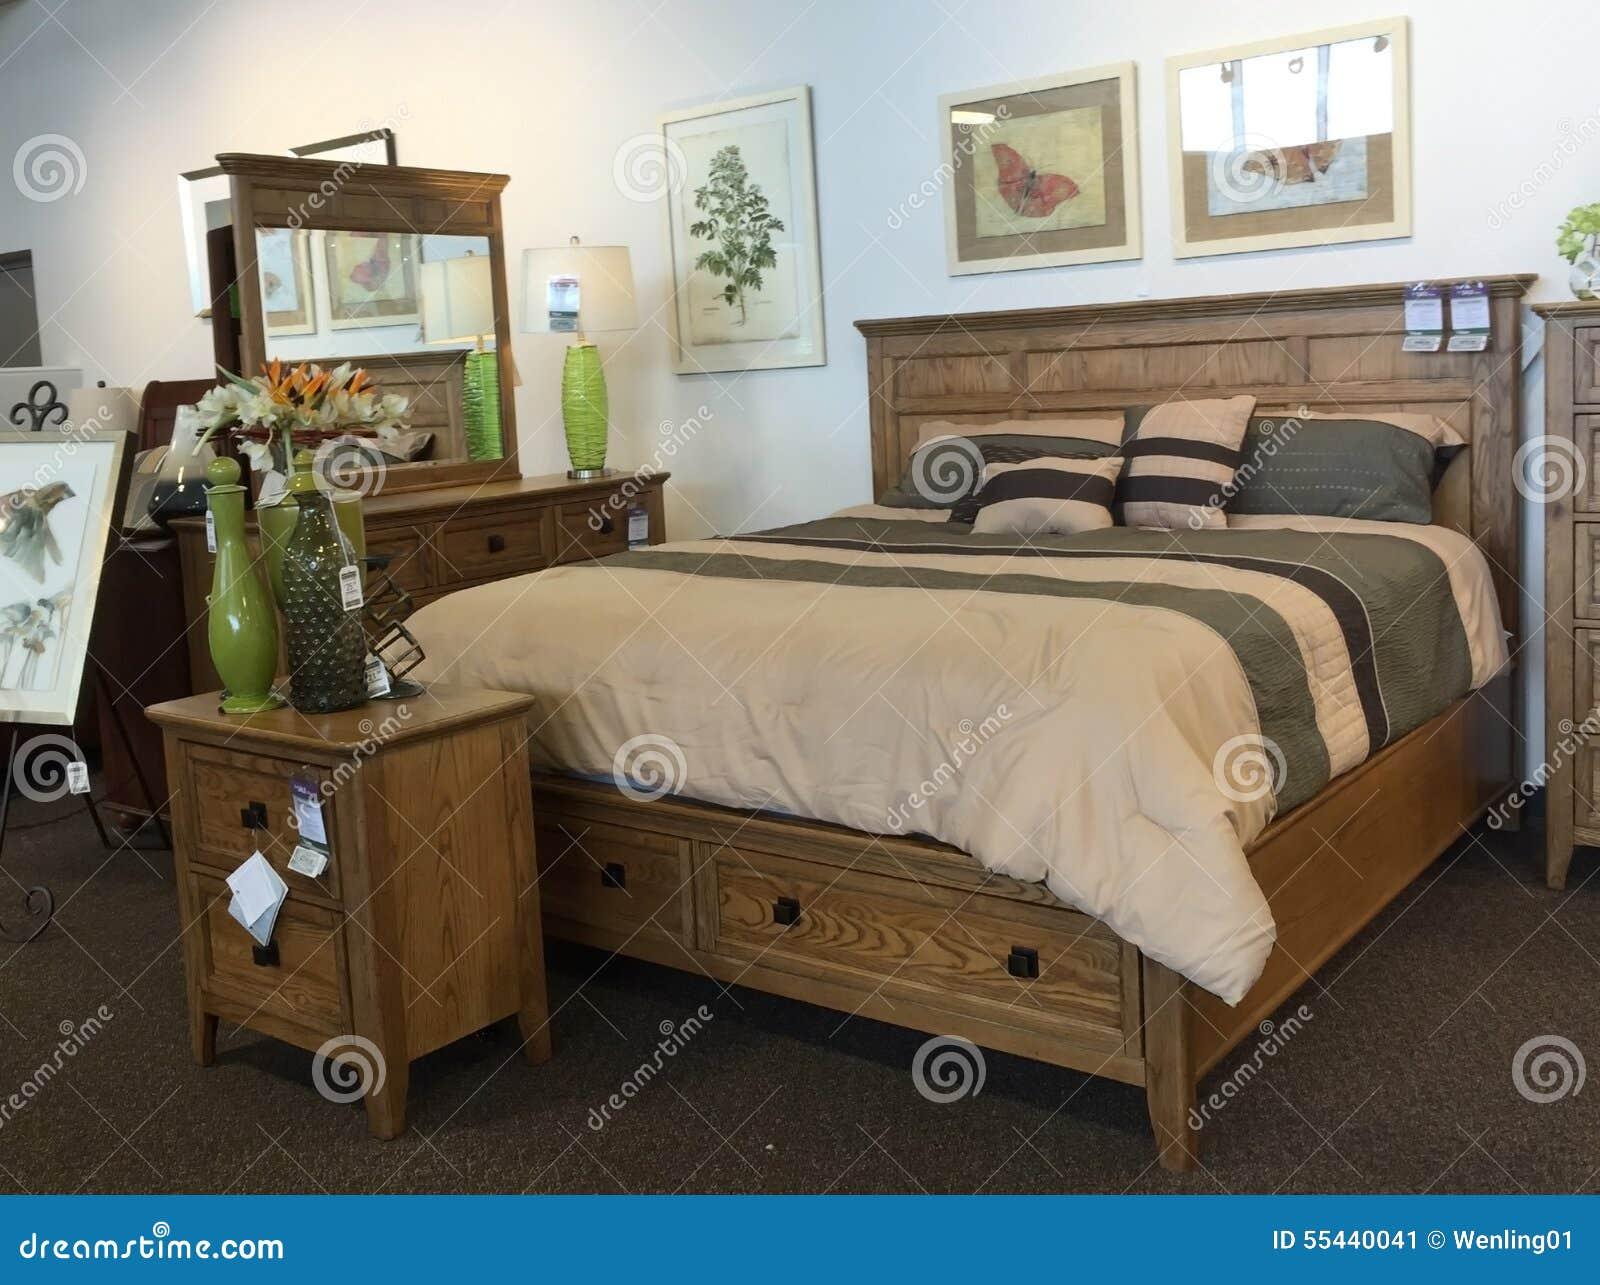 Selling Bedroom Furniture Wooden Bedroom Furniture Selling Editorial Photo Image 55440041